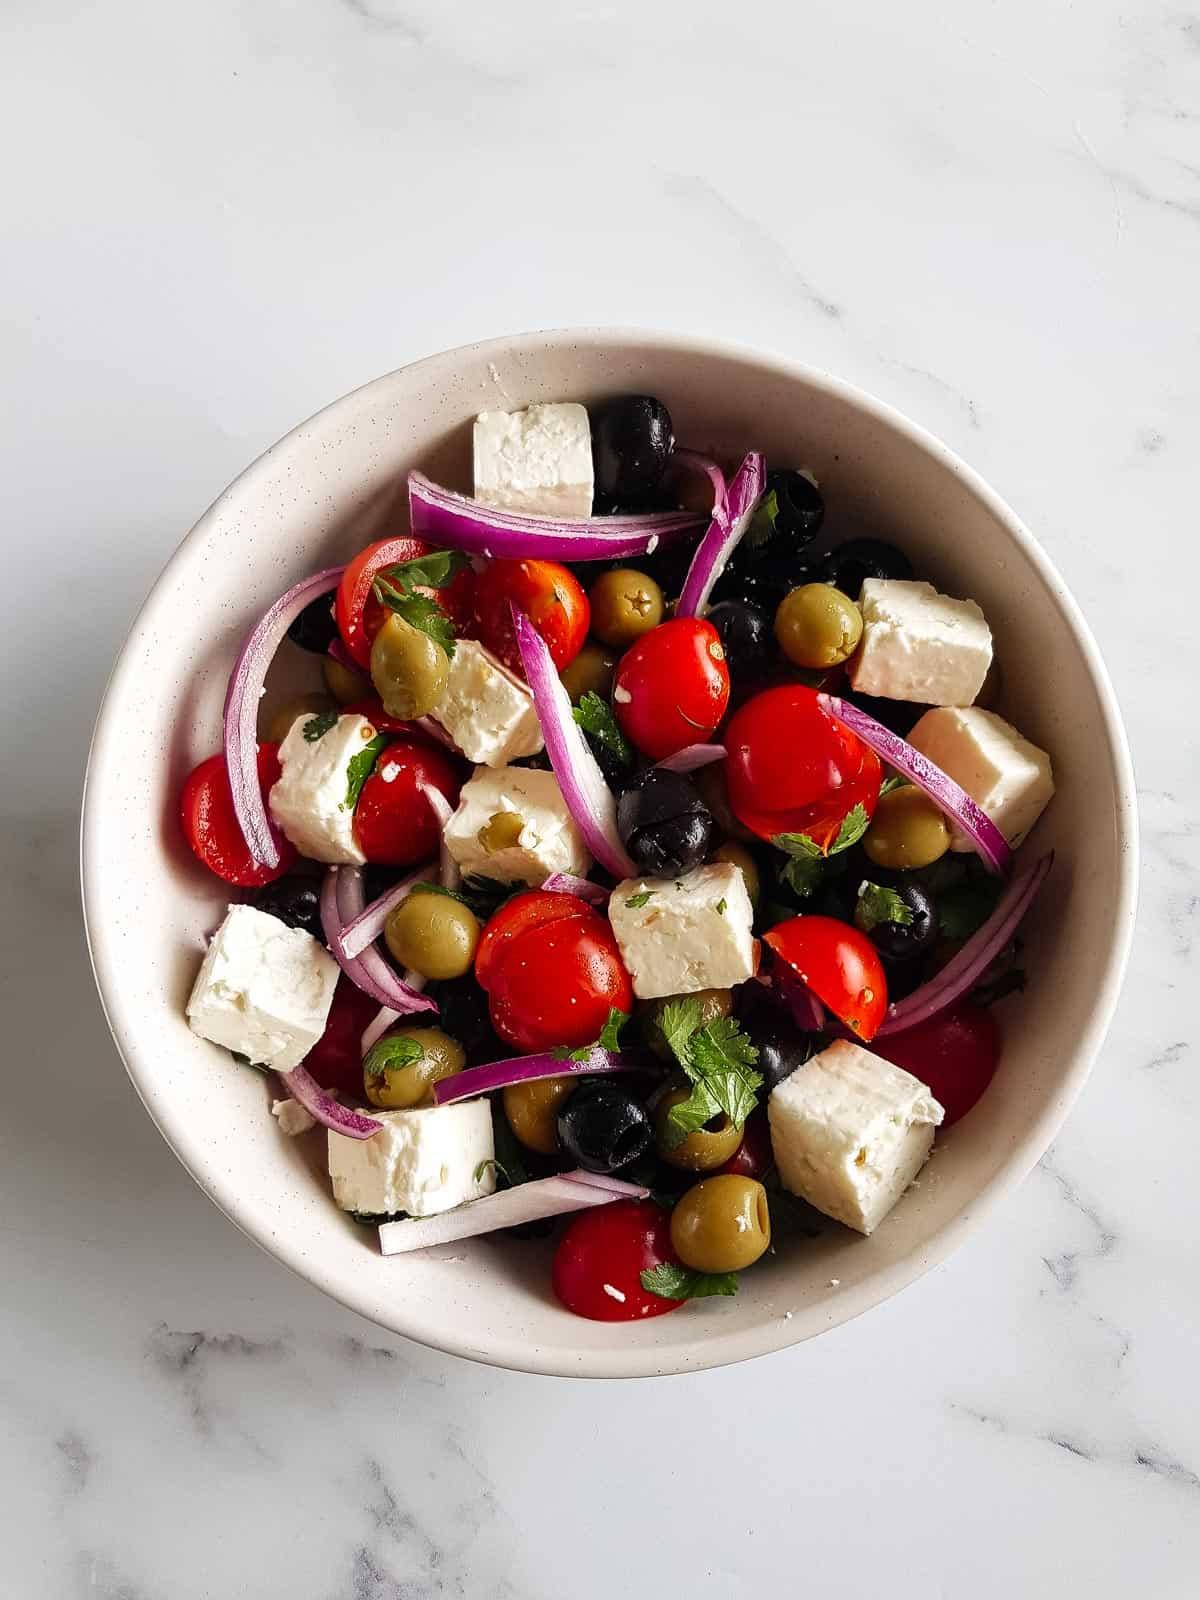 Mediterranean olive salad in a bowl.